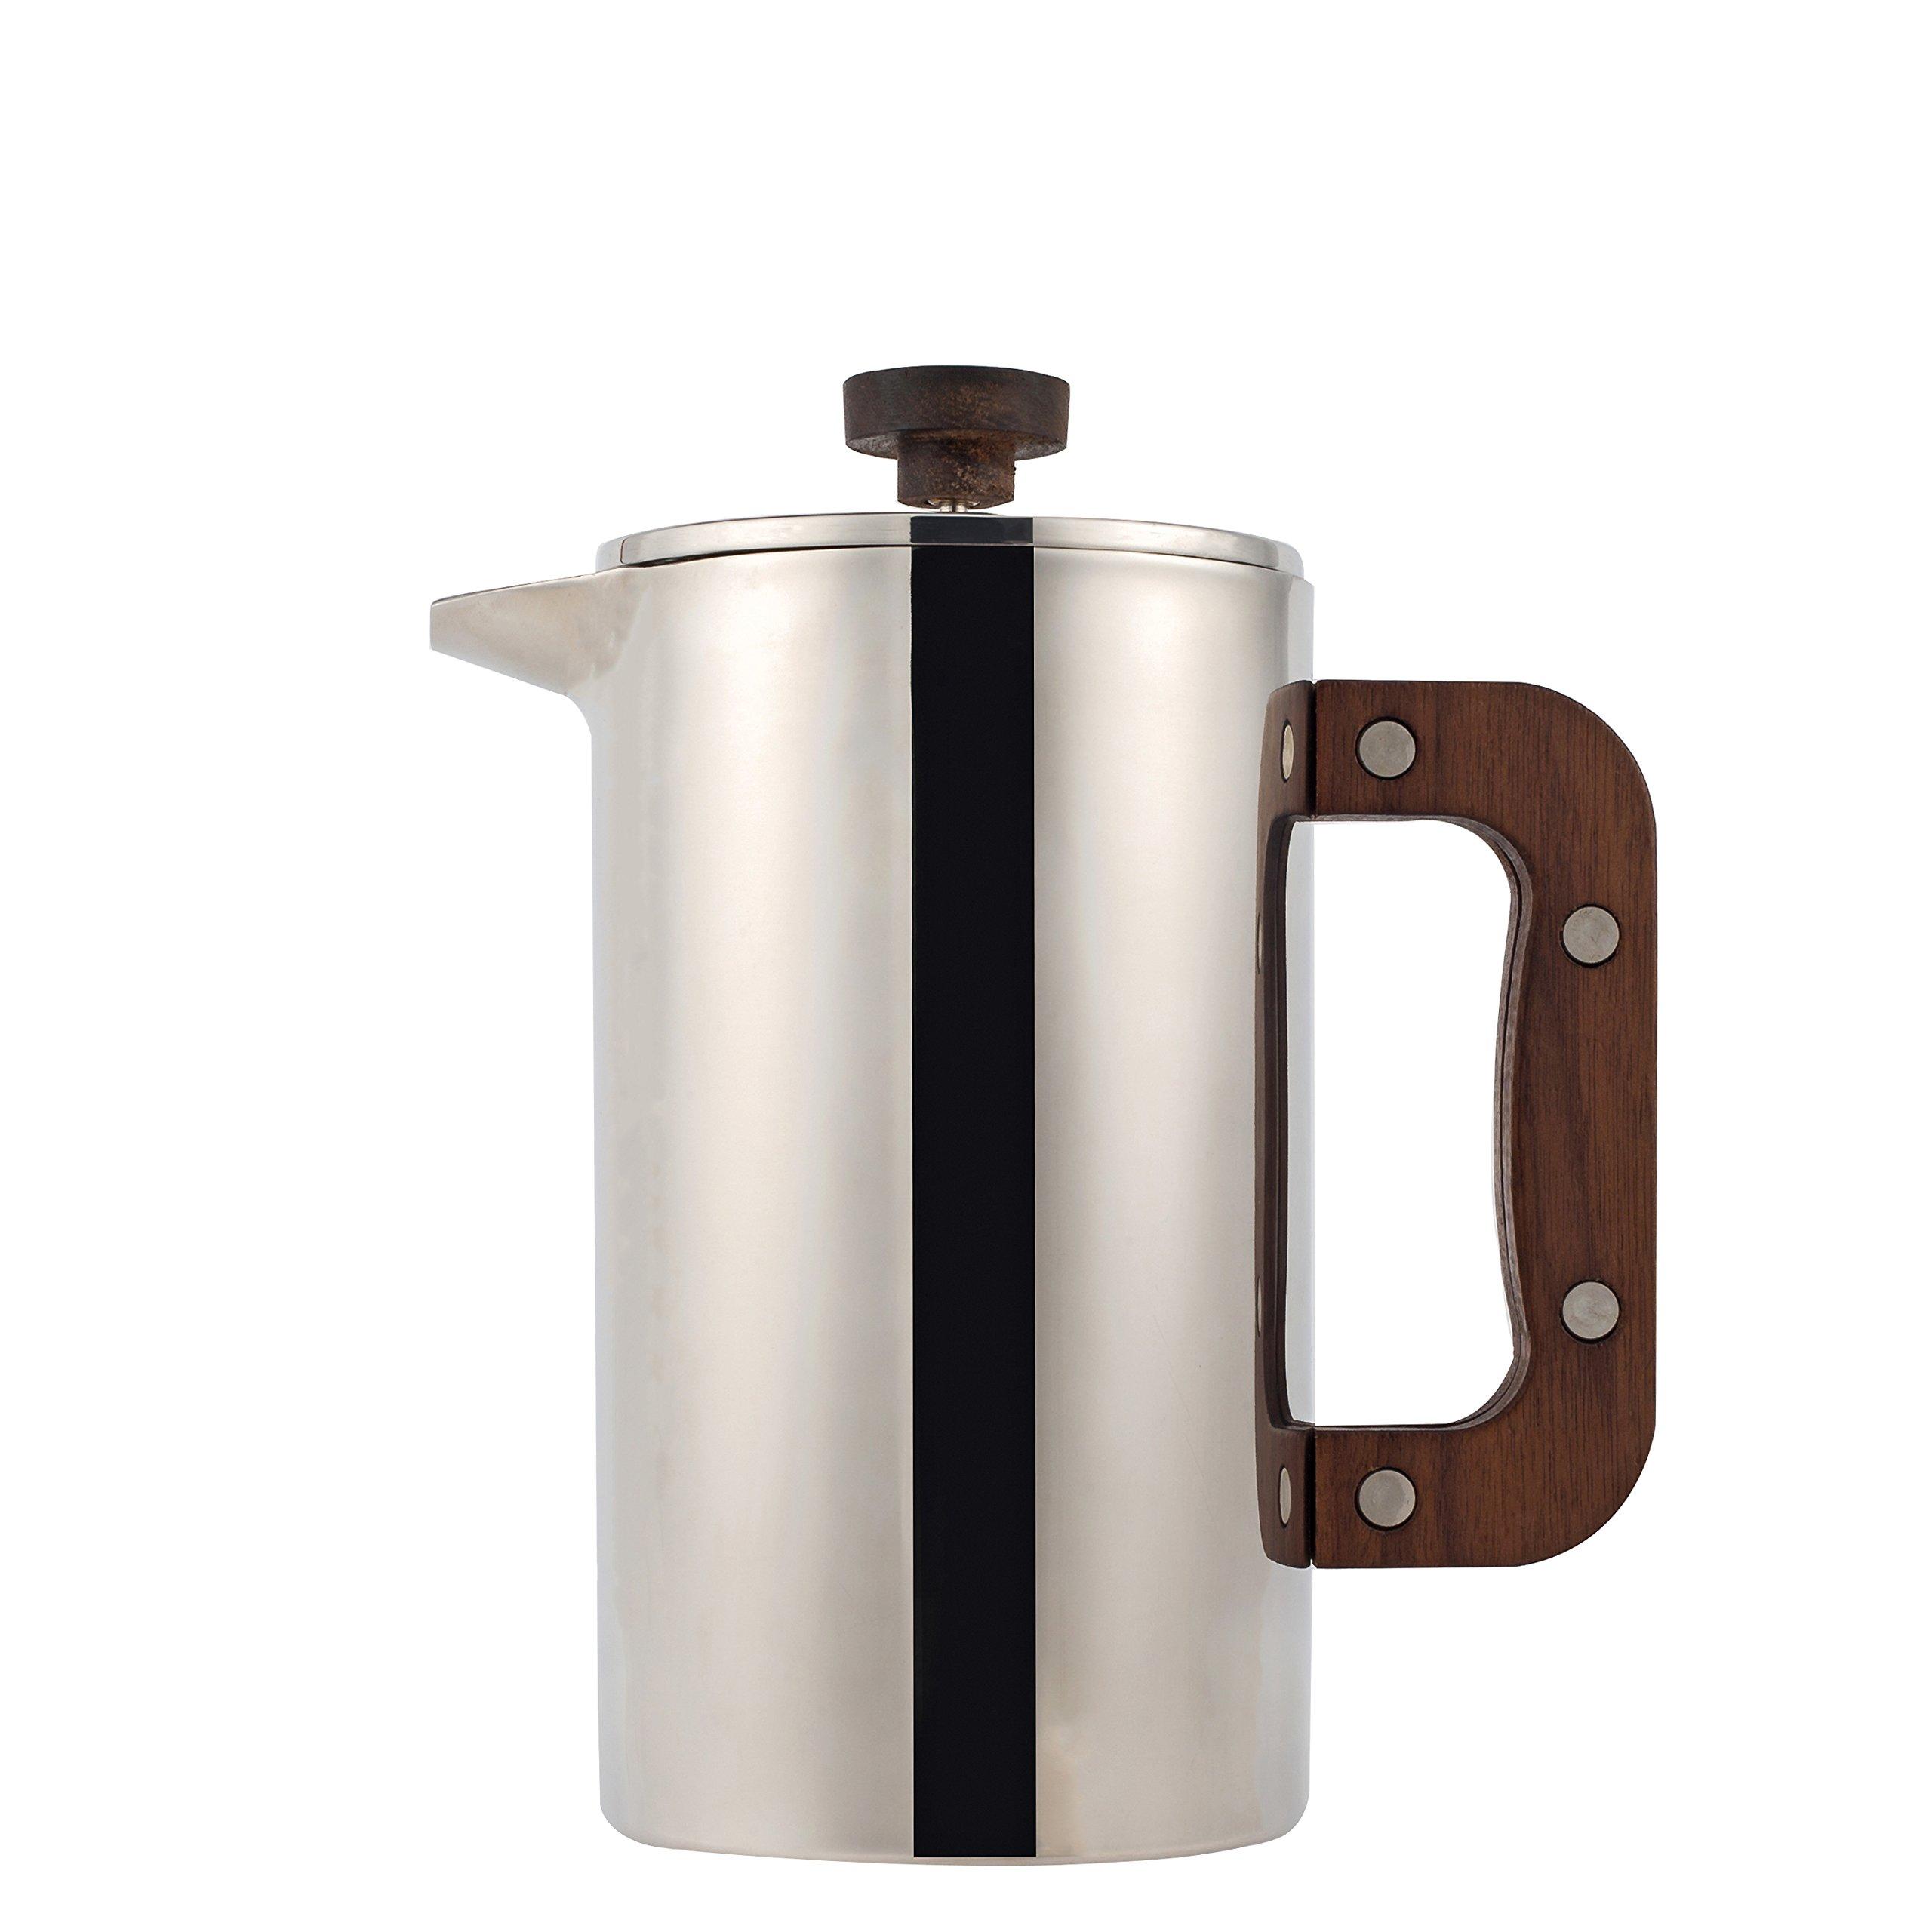 Meelio French Press Coffee Maker,1 Liter Insulate Tea/Cafe Pot with Walnut Handle and lid (Bonus 2 filter screen)